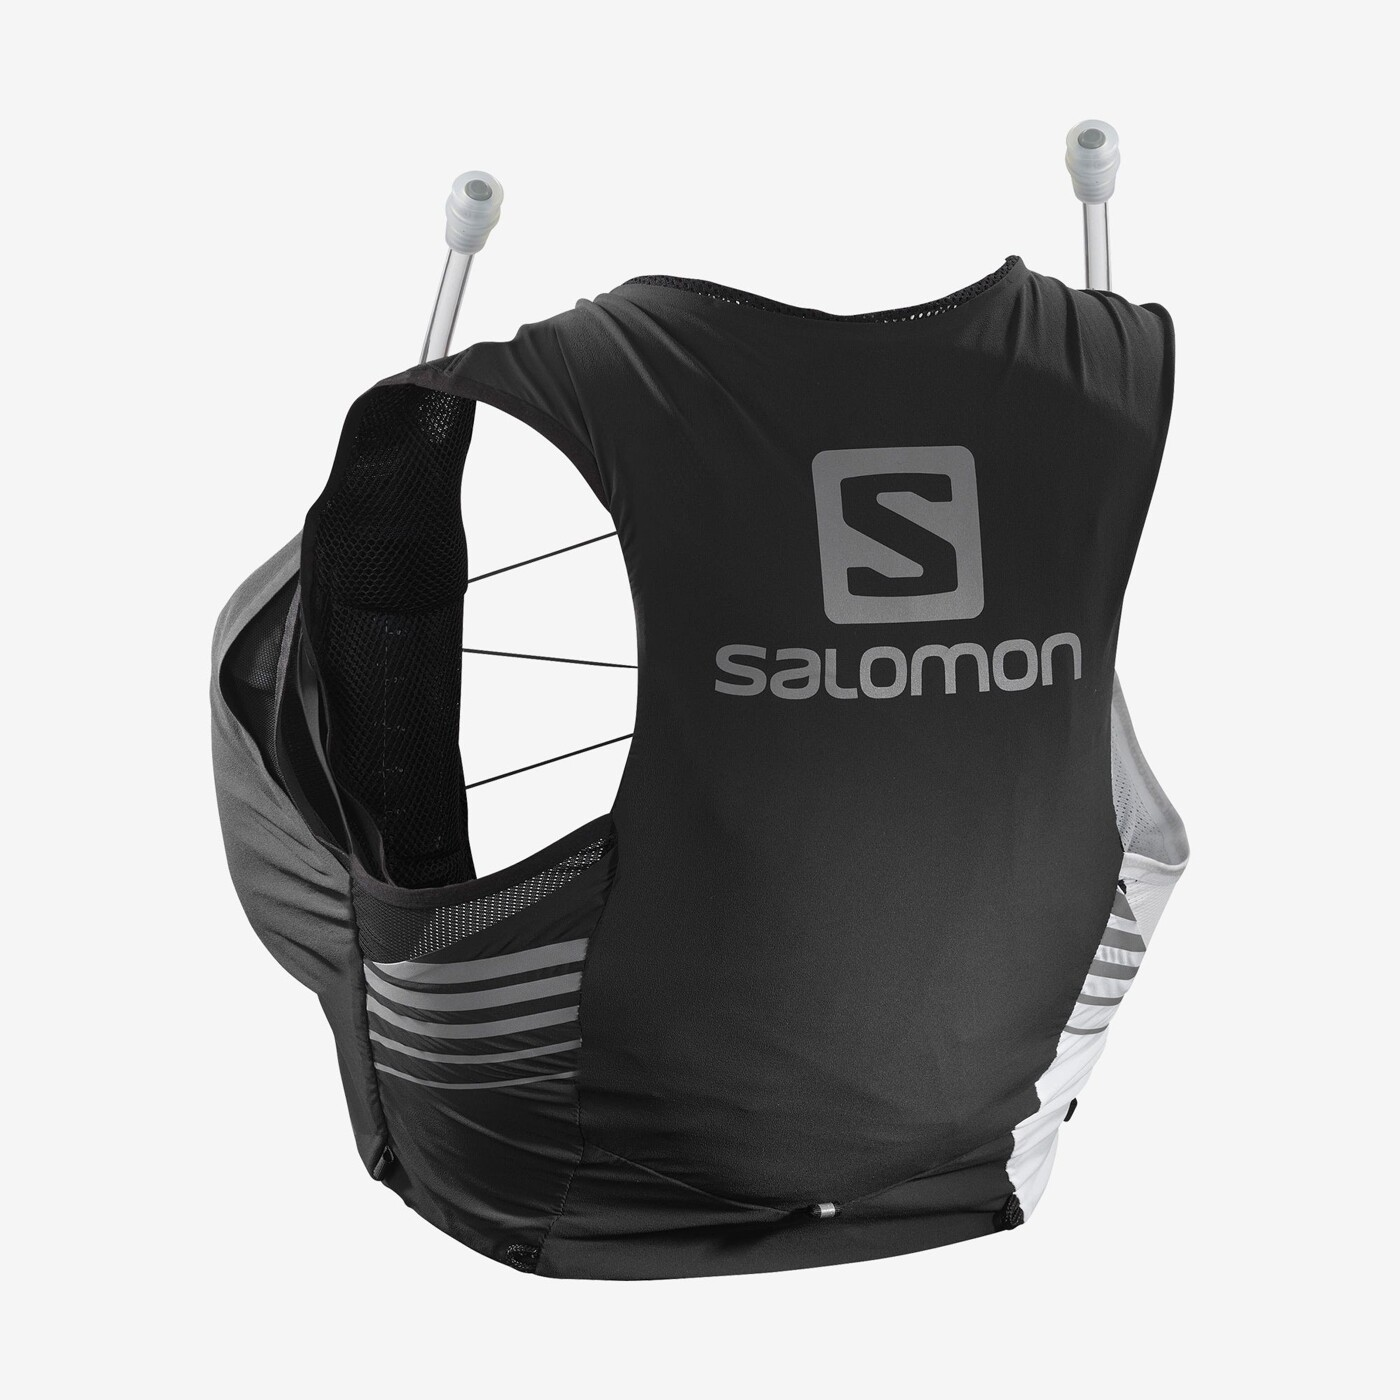 SALOMON SENSE 5 SET WOMEN LTD EDITION Damen - Laufweste mit Flasks